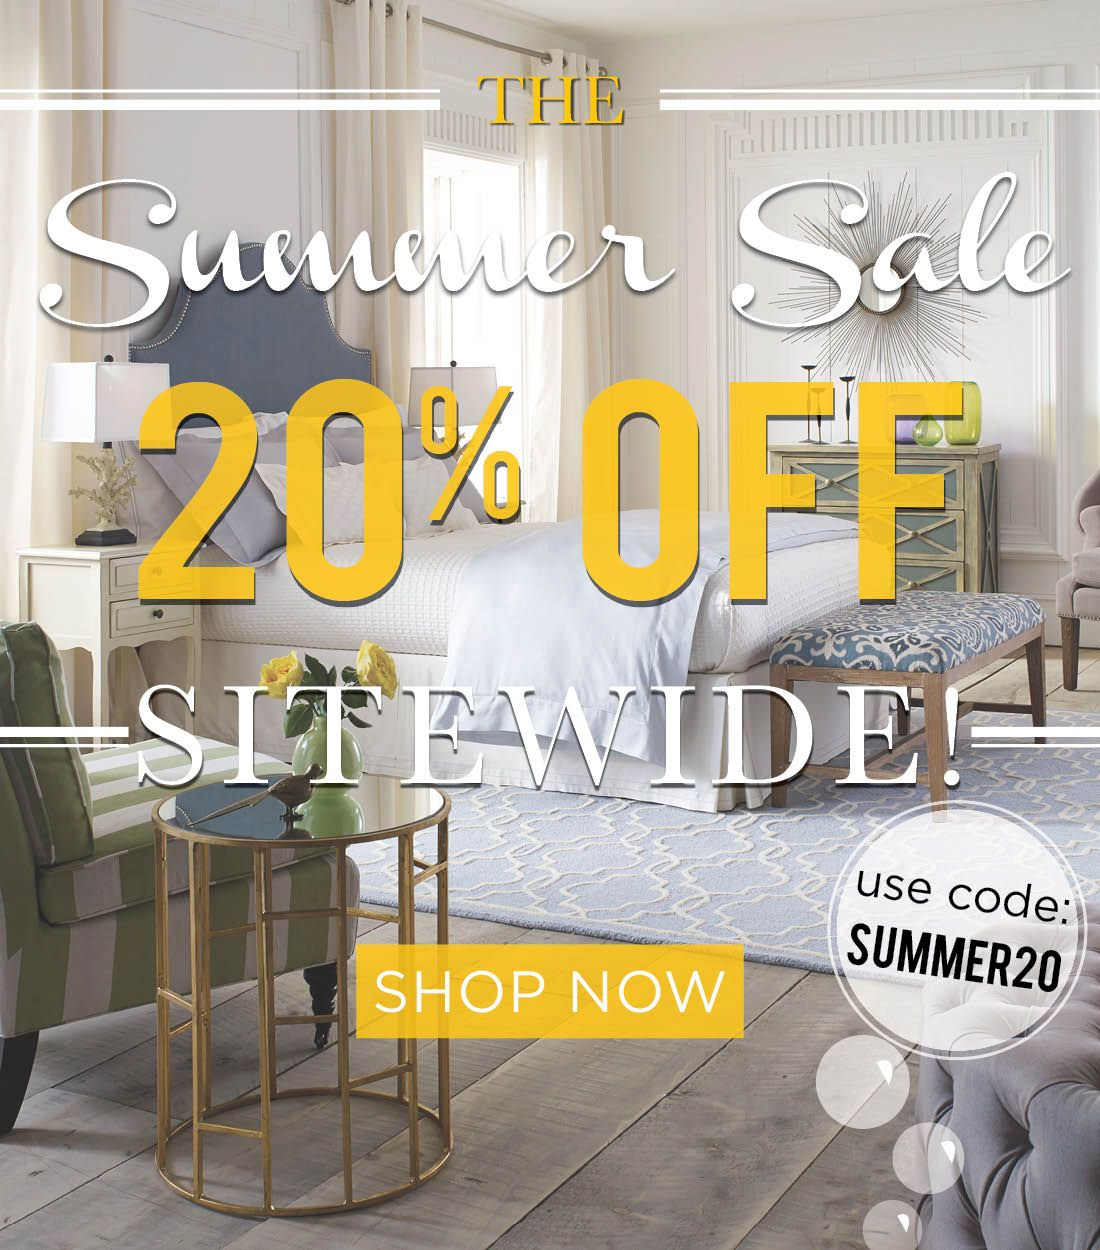 Home Decorators Collection Coupons Promo Codes Deals: DON'T MISS OUT! DÉCOR MARKET'S SUMMER SALE! Save 20